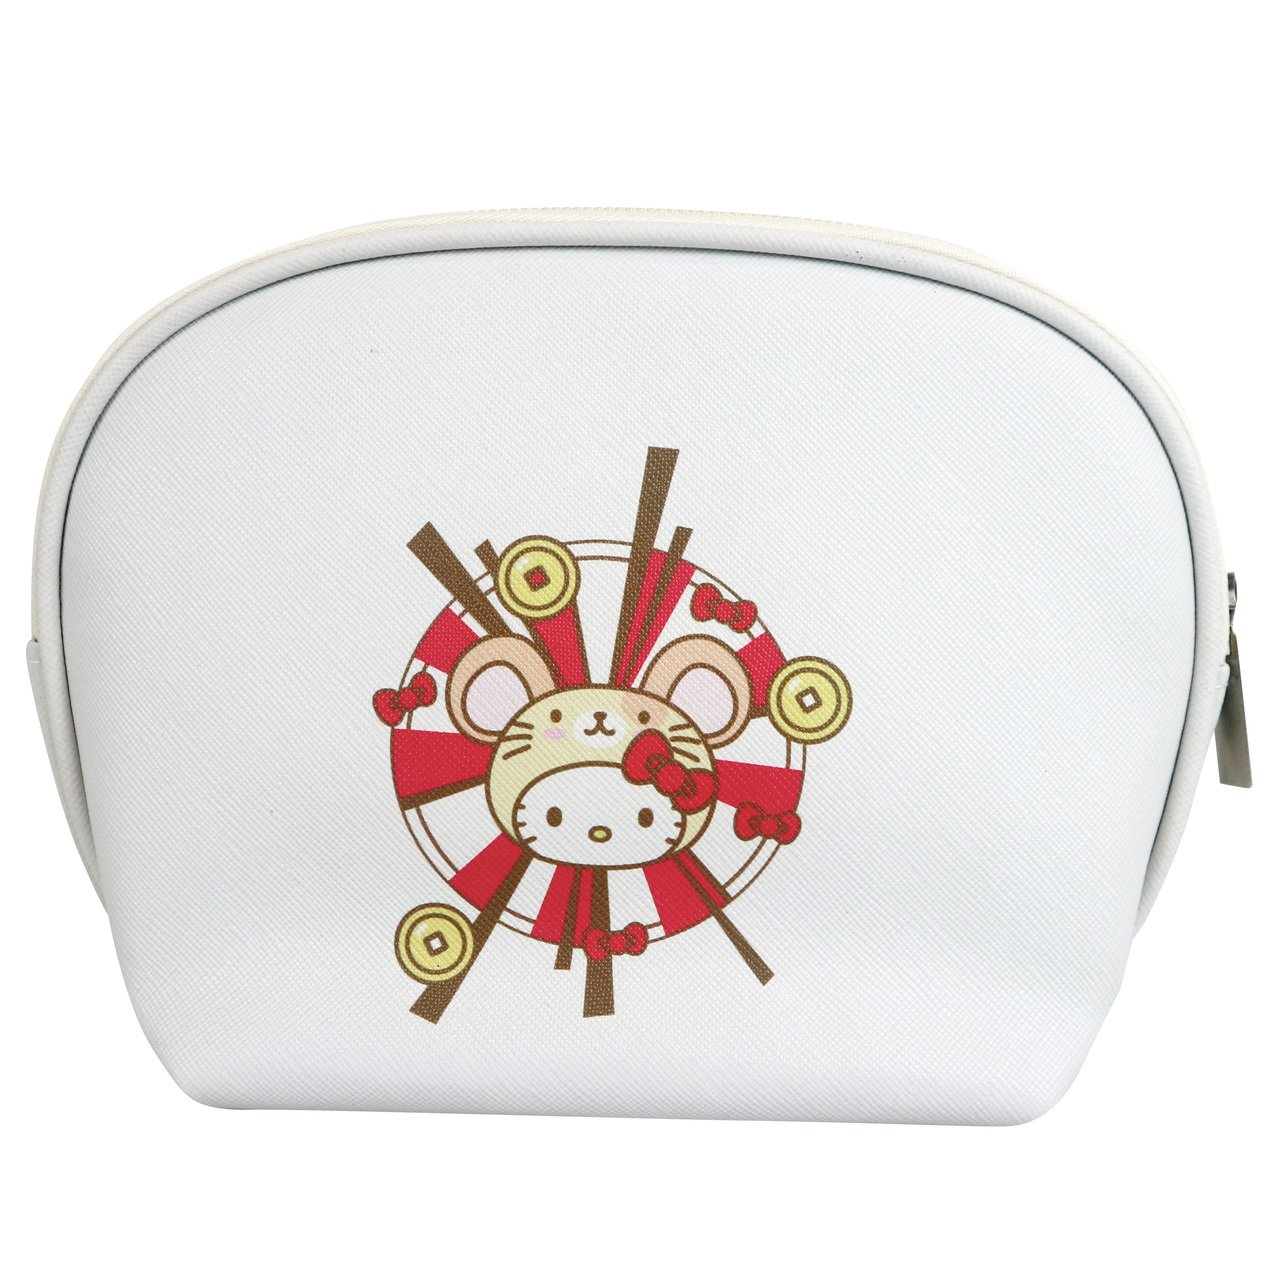 7-ELEVEN「Hello Kitty金鼠年限定萬用包」白色款背面。圖/7-E...